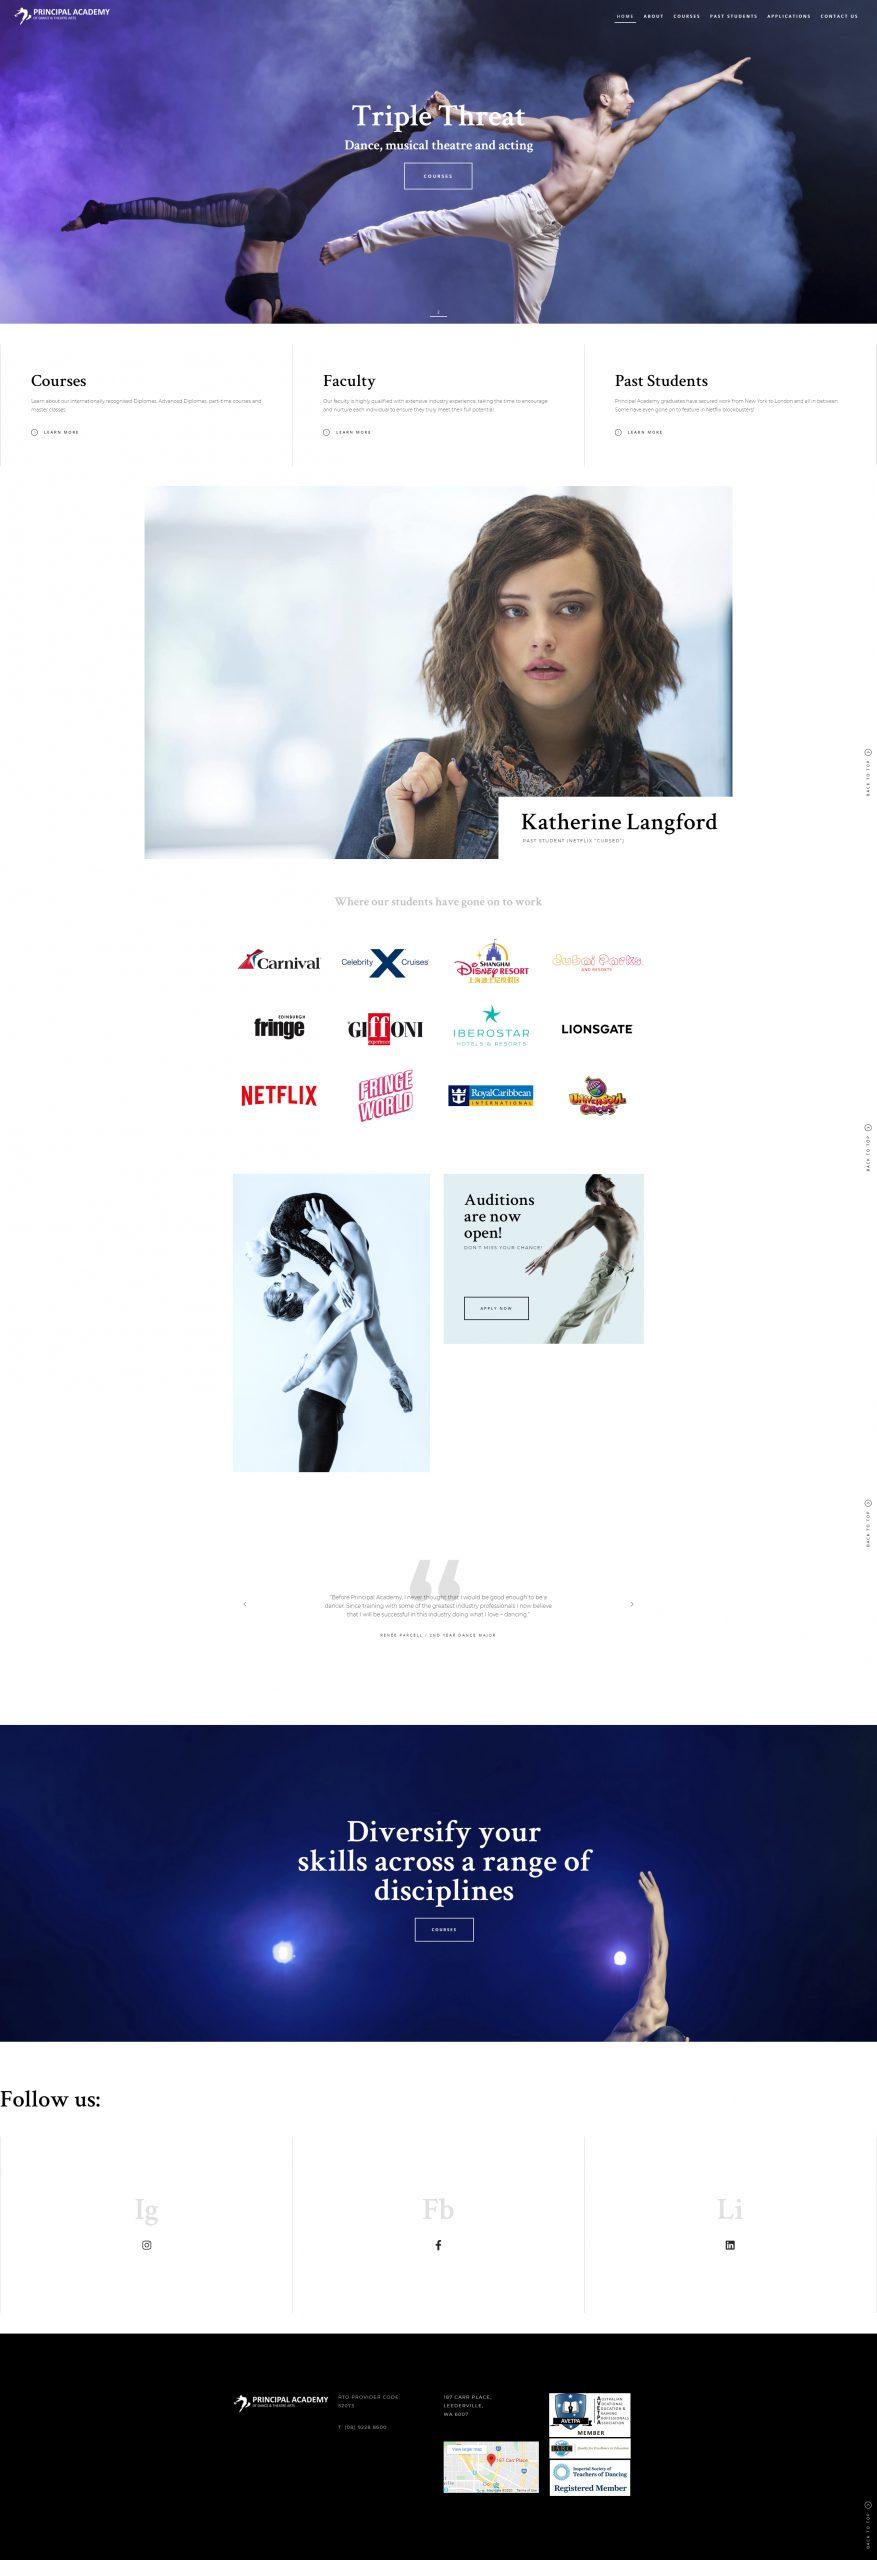 Bray Marketing - Web Design Perth - Marketing Perth - Principal Academy of Dance and Theatre Arts